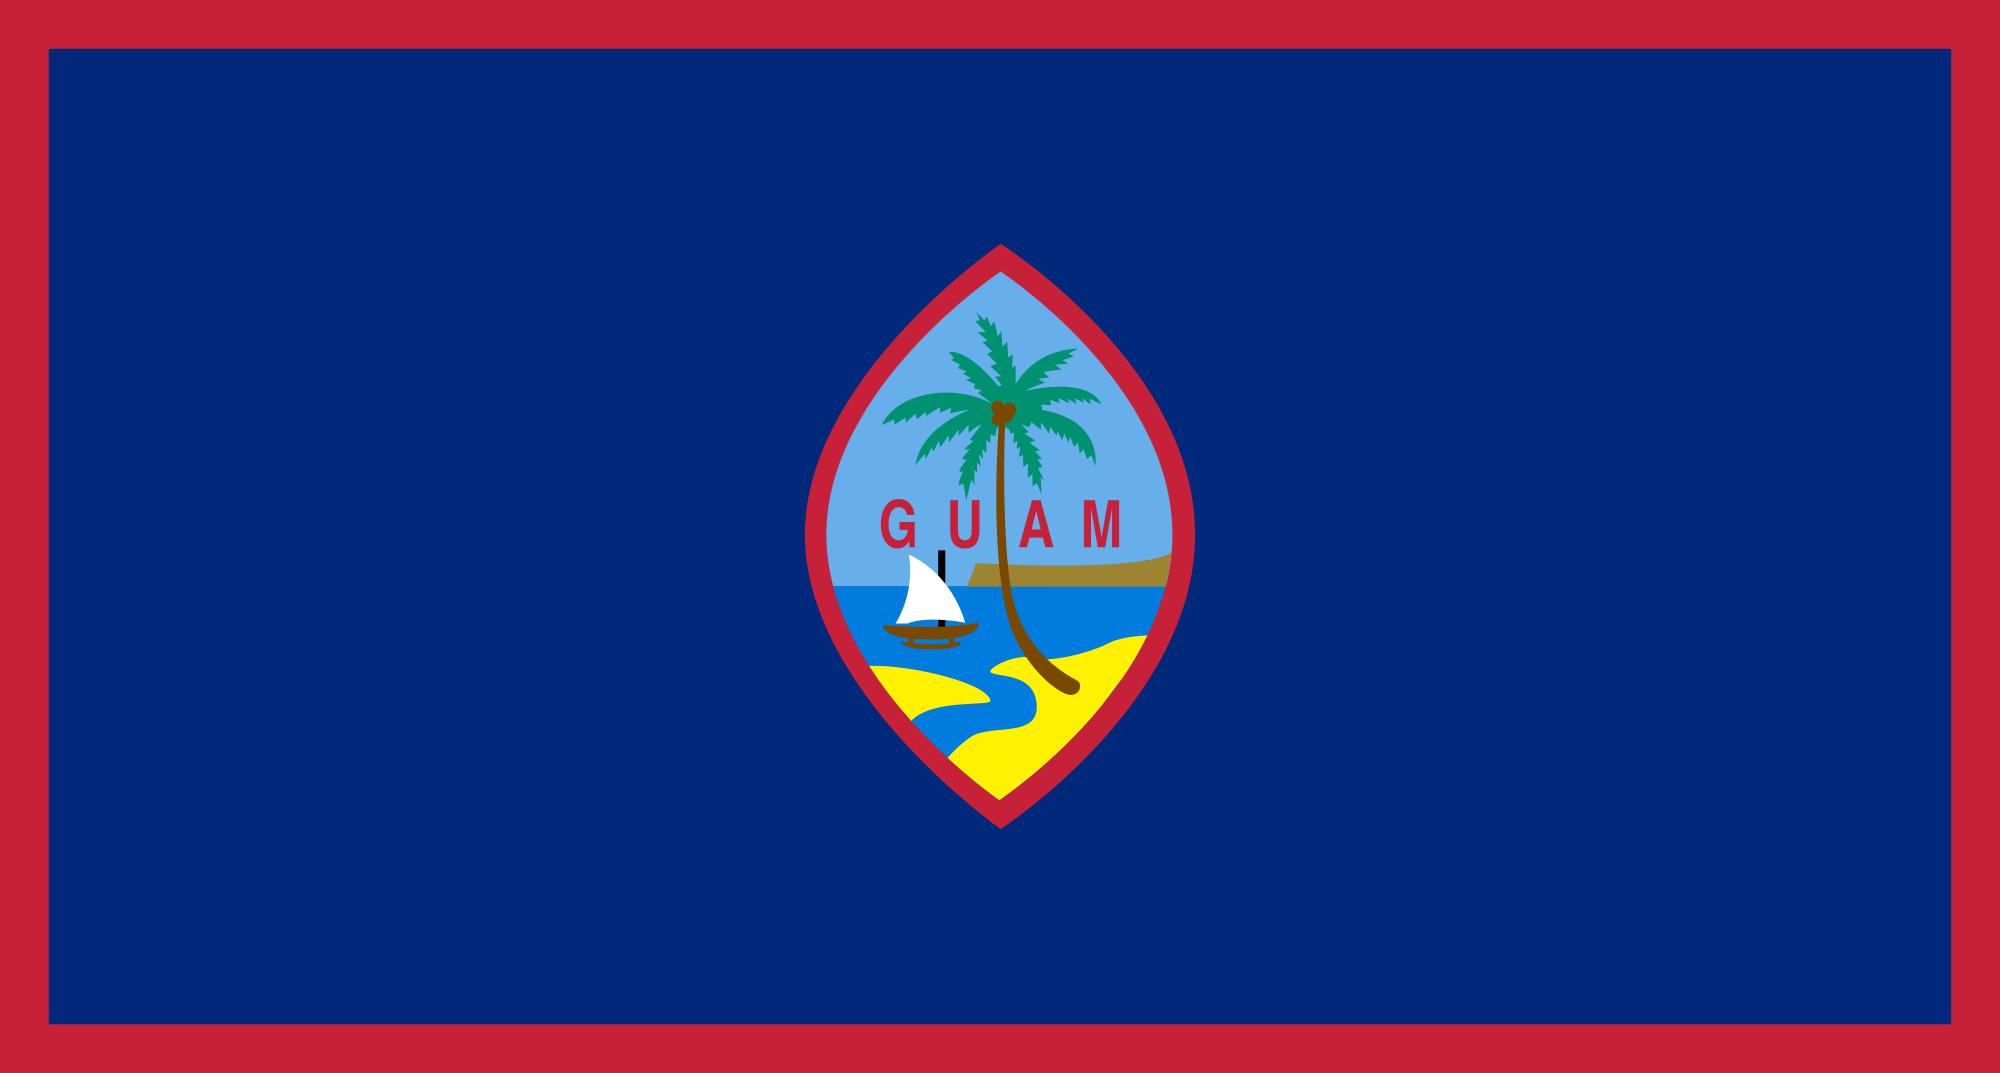 guam, देश, emblema, लोग�प्रतीकbolo - HD वॉलपेपर - प्रोफेसर-falken.com